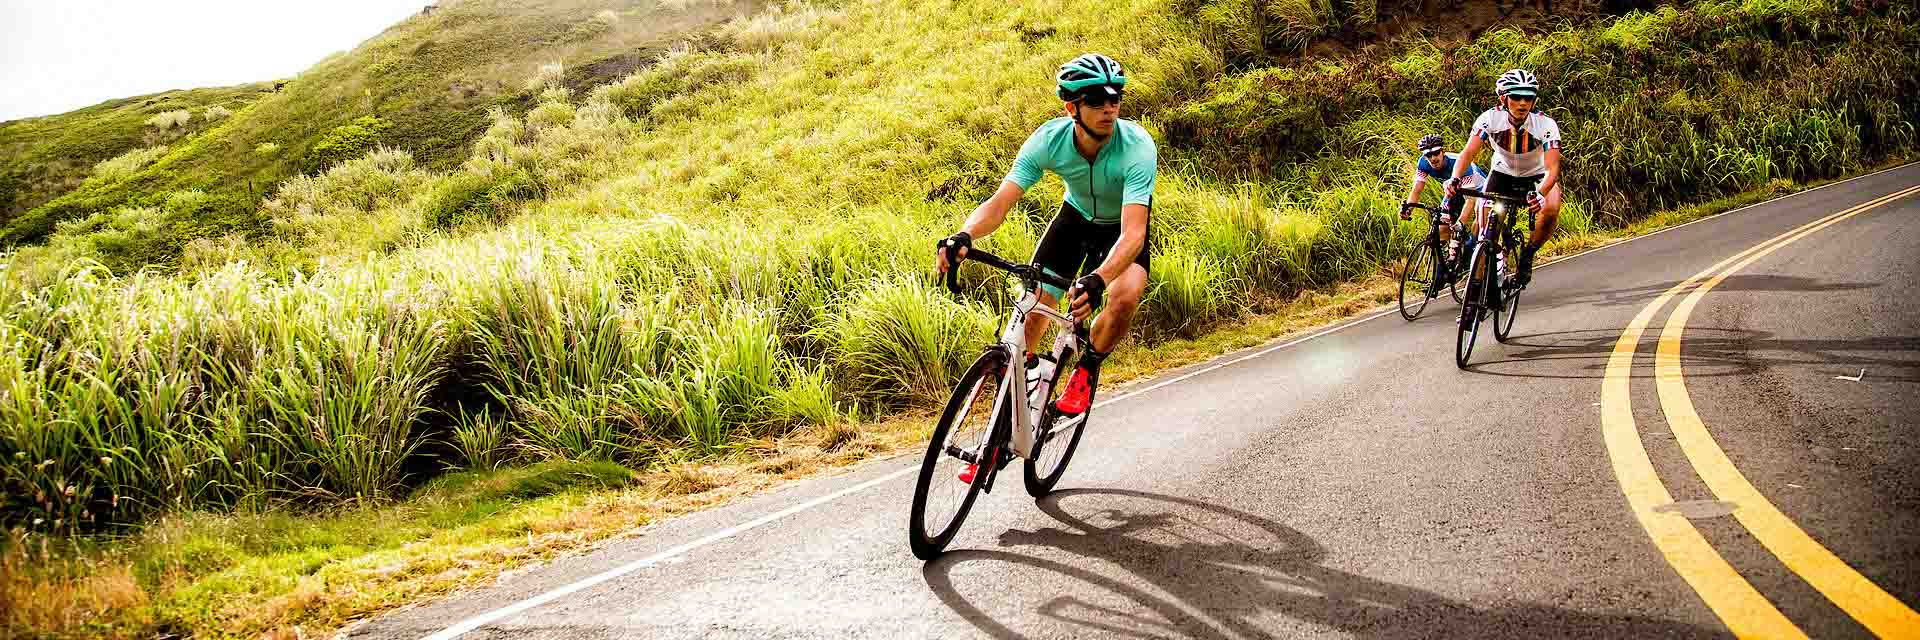 Road Bikes at Trek Bicycle Superstore